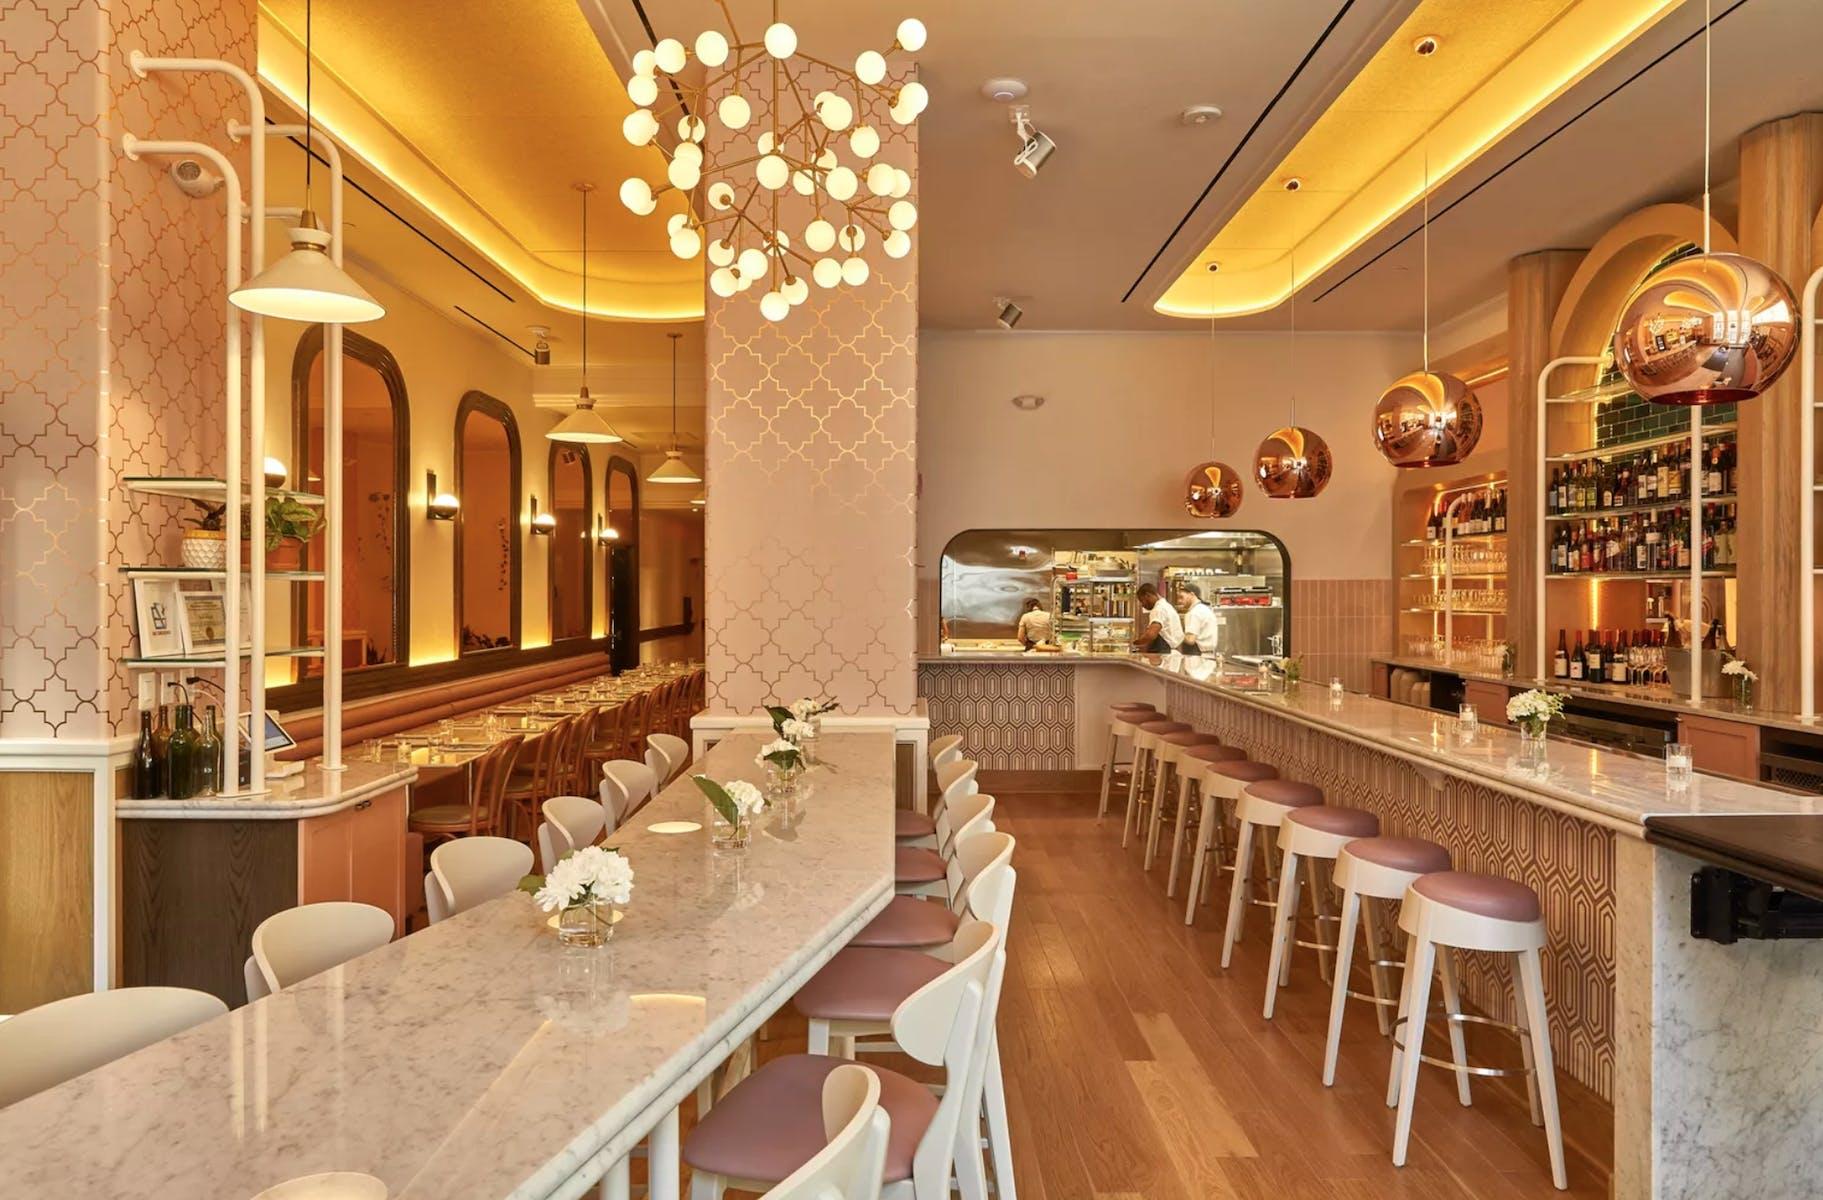 Hadramawt restaurant kleinbettingen udinese v catania betting preview on betfair